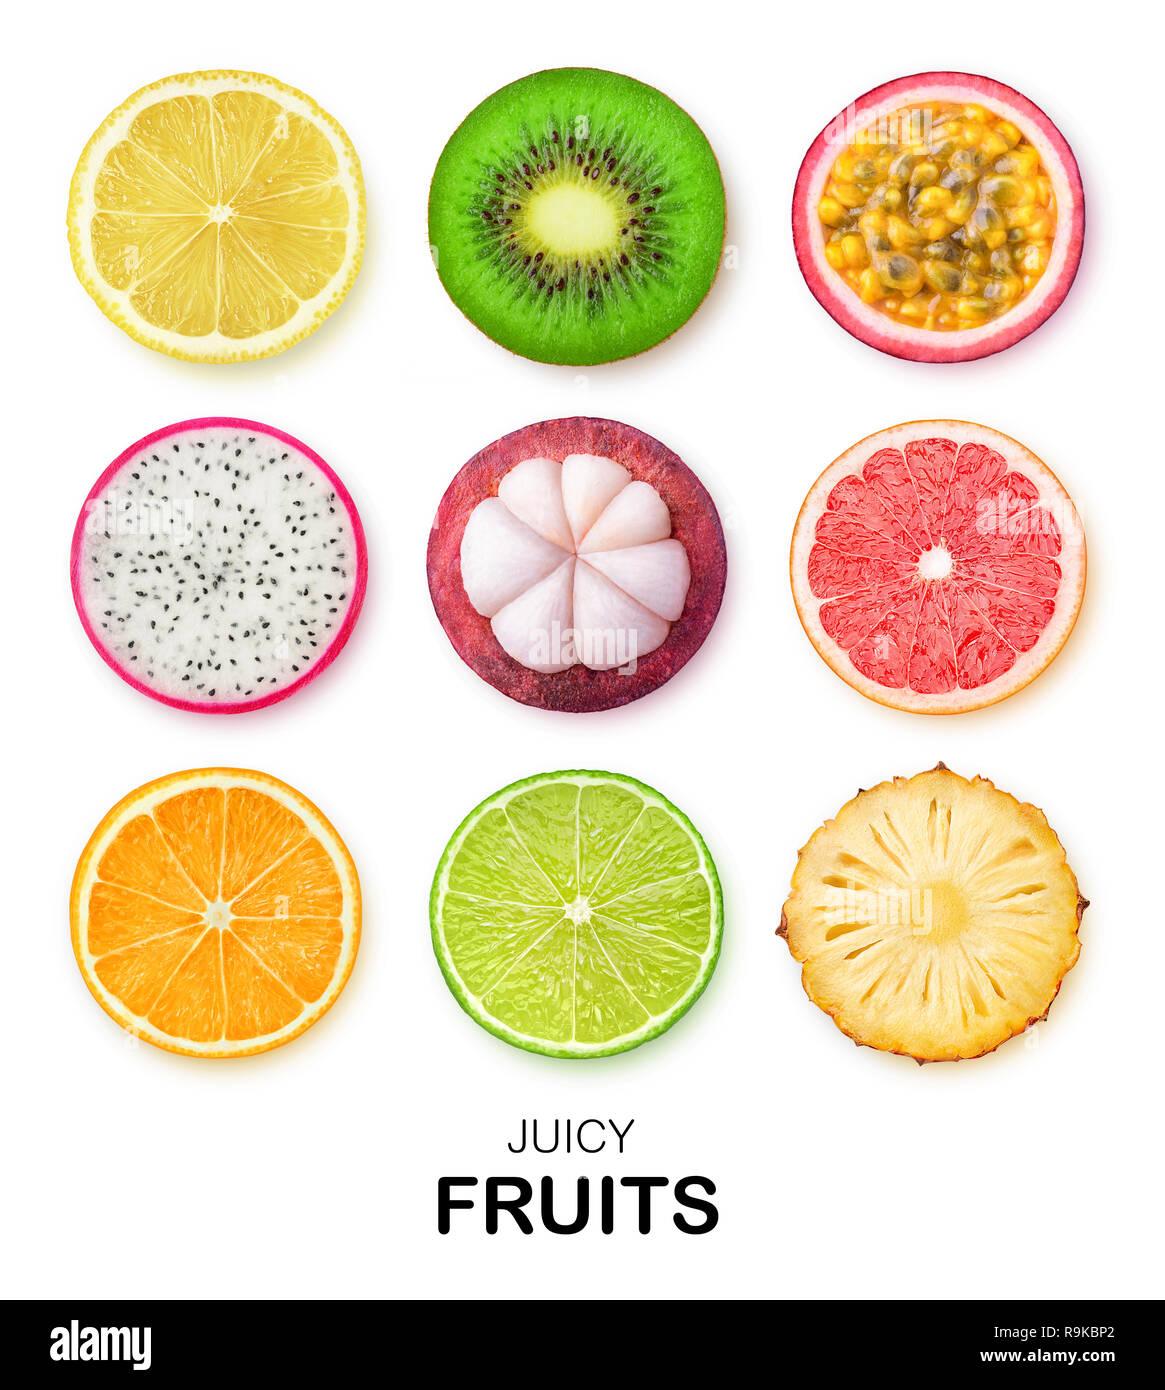 Isolated fruits slices. Pieces of lemon, kiwi, passion fruit, dragon fruit, mangosteen, grapefruit, orange, lime and pineapple isolated on white backg Stock Photo